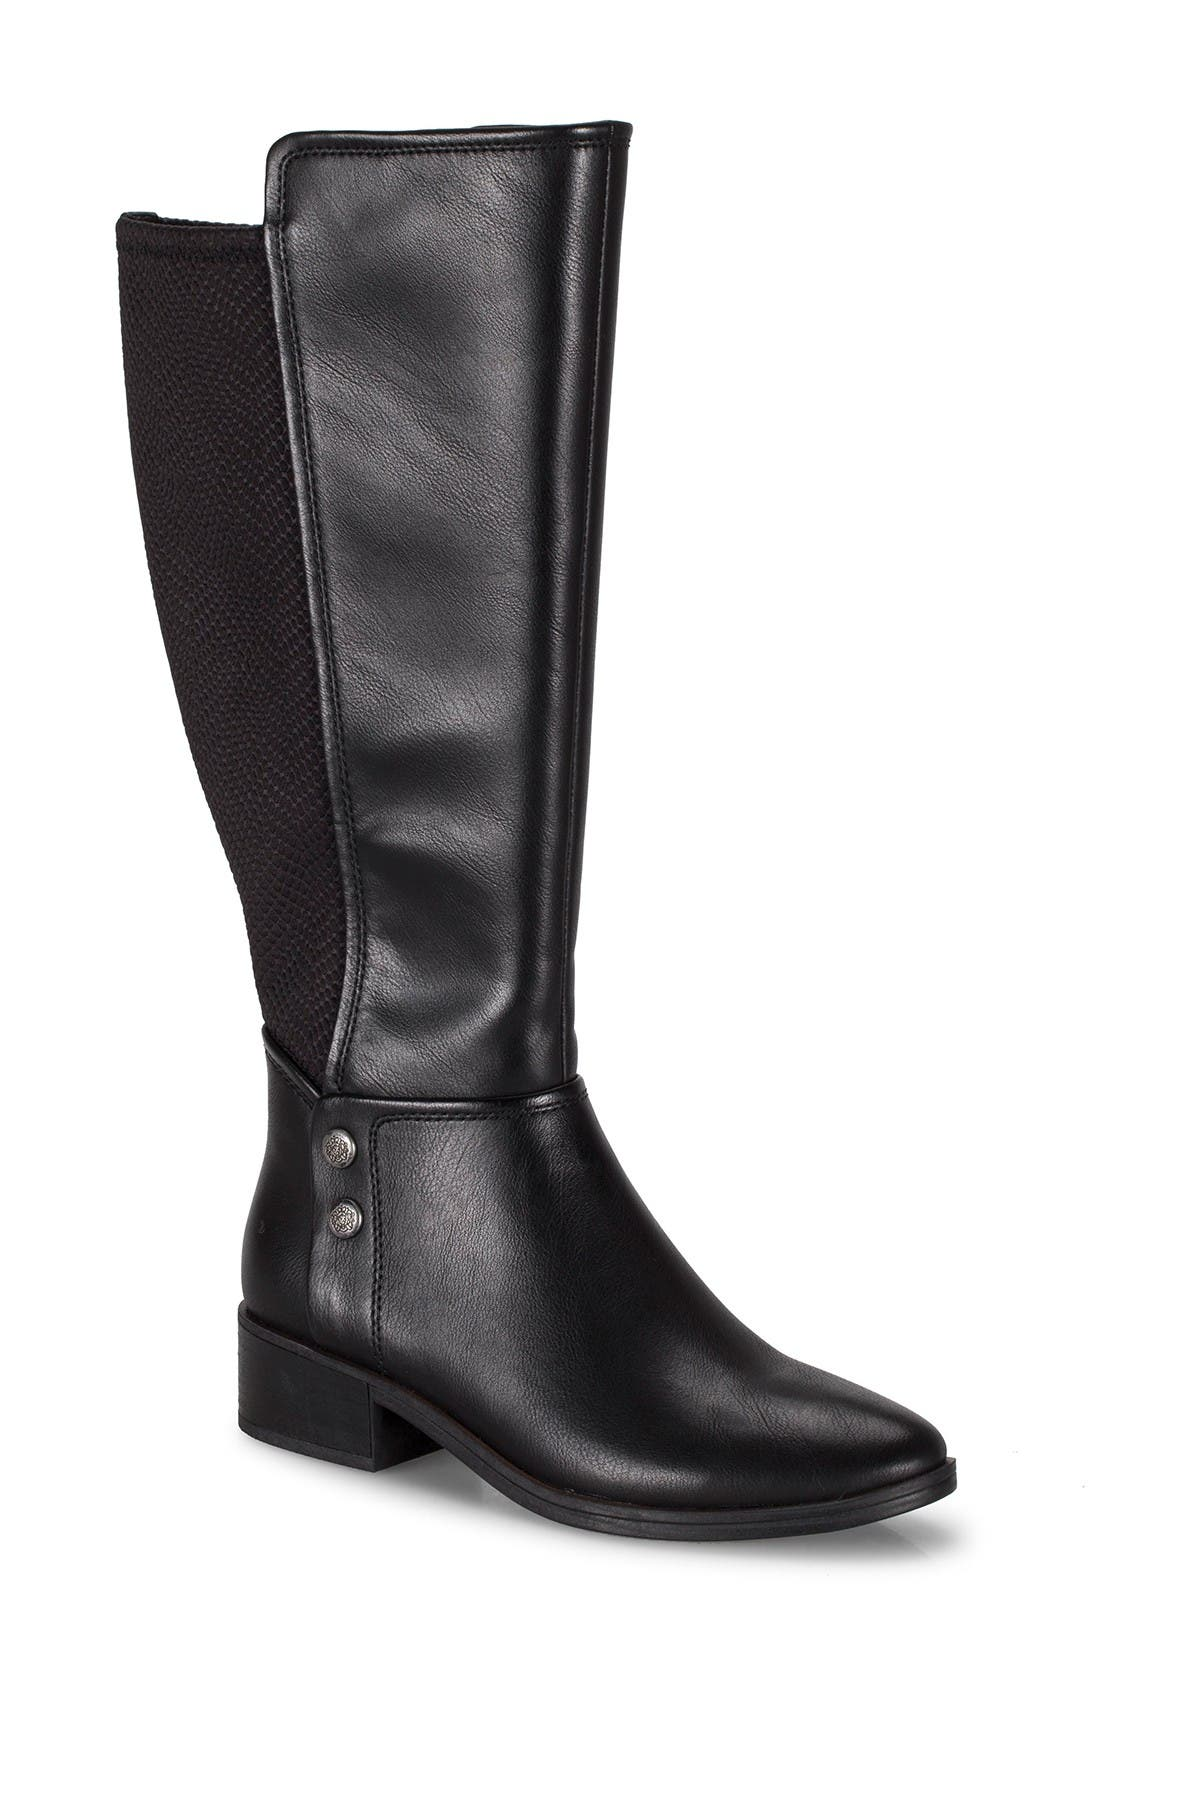 BareTraps | Magi Tall Shaft Riding Boot